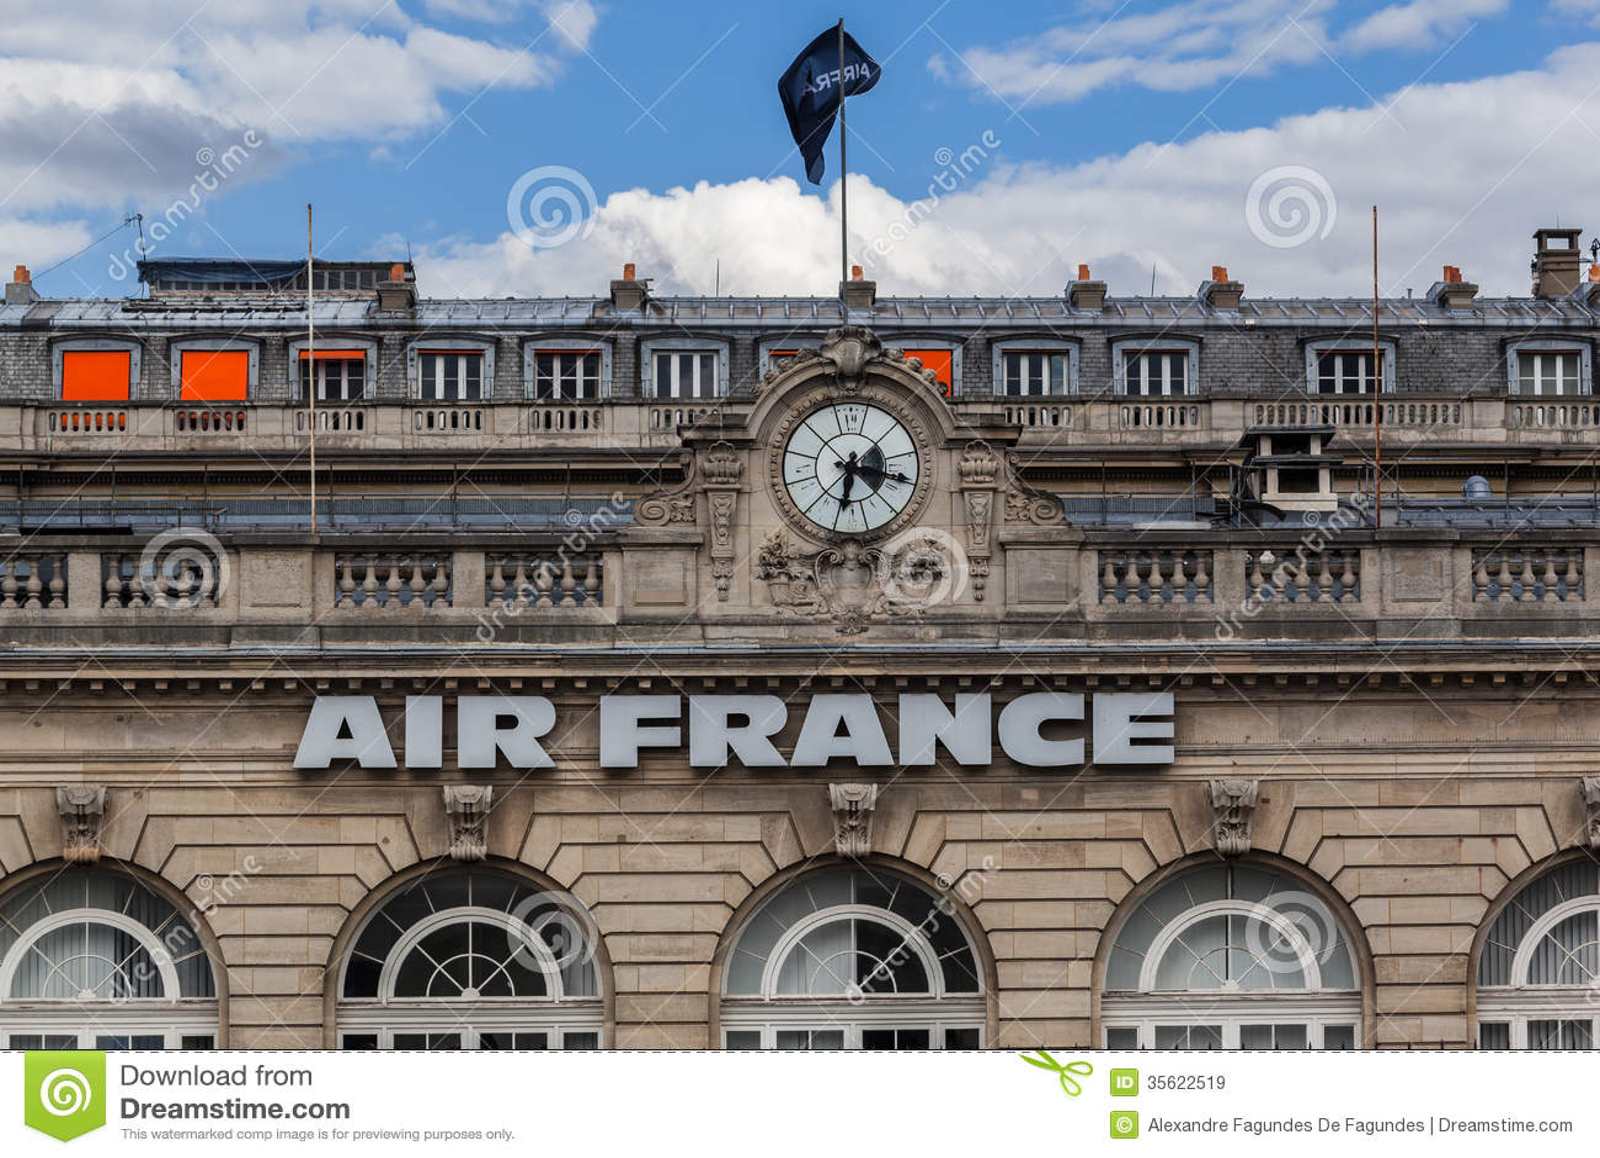 air france building paris france editorial stock image image 35622519. Black Bedroom Furniture Sets. Home Design Ideas